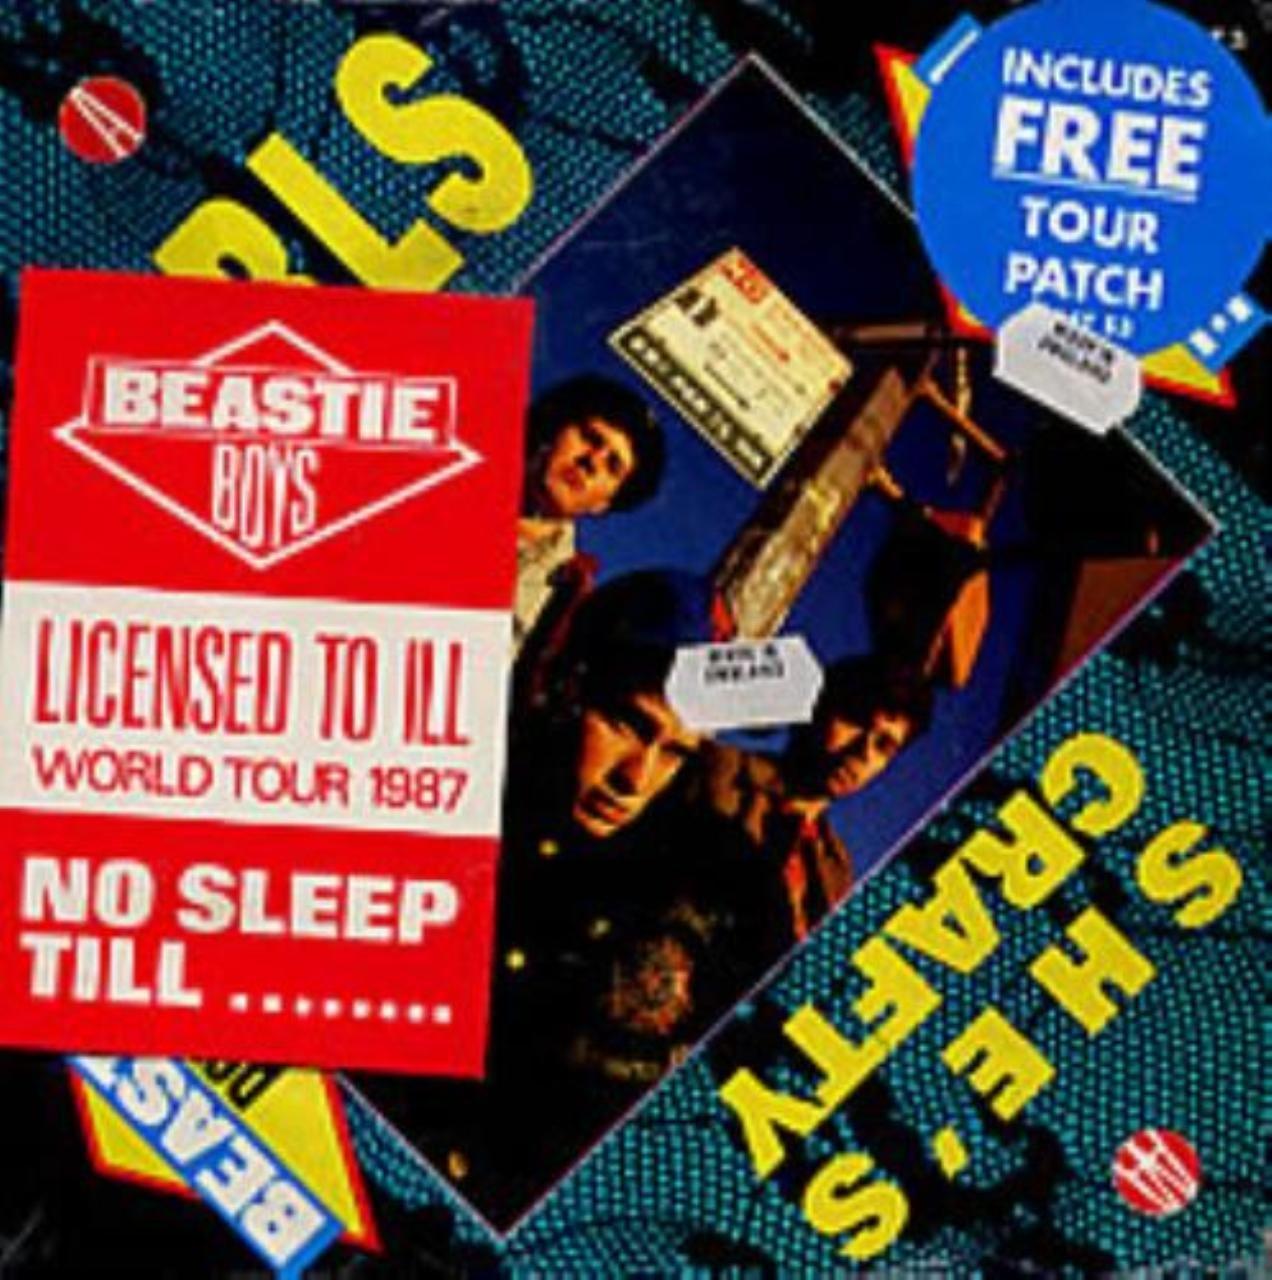 Girls She S Crafty Beastie Boys 7 45 Amazon Co Uk Music